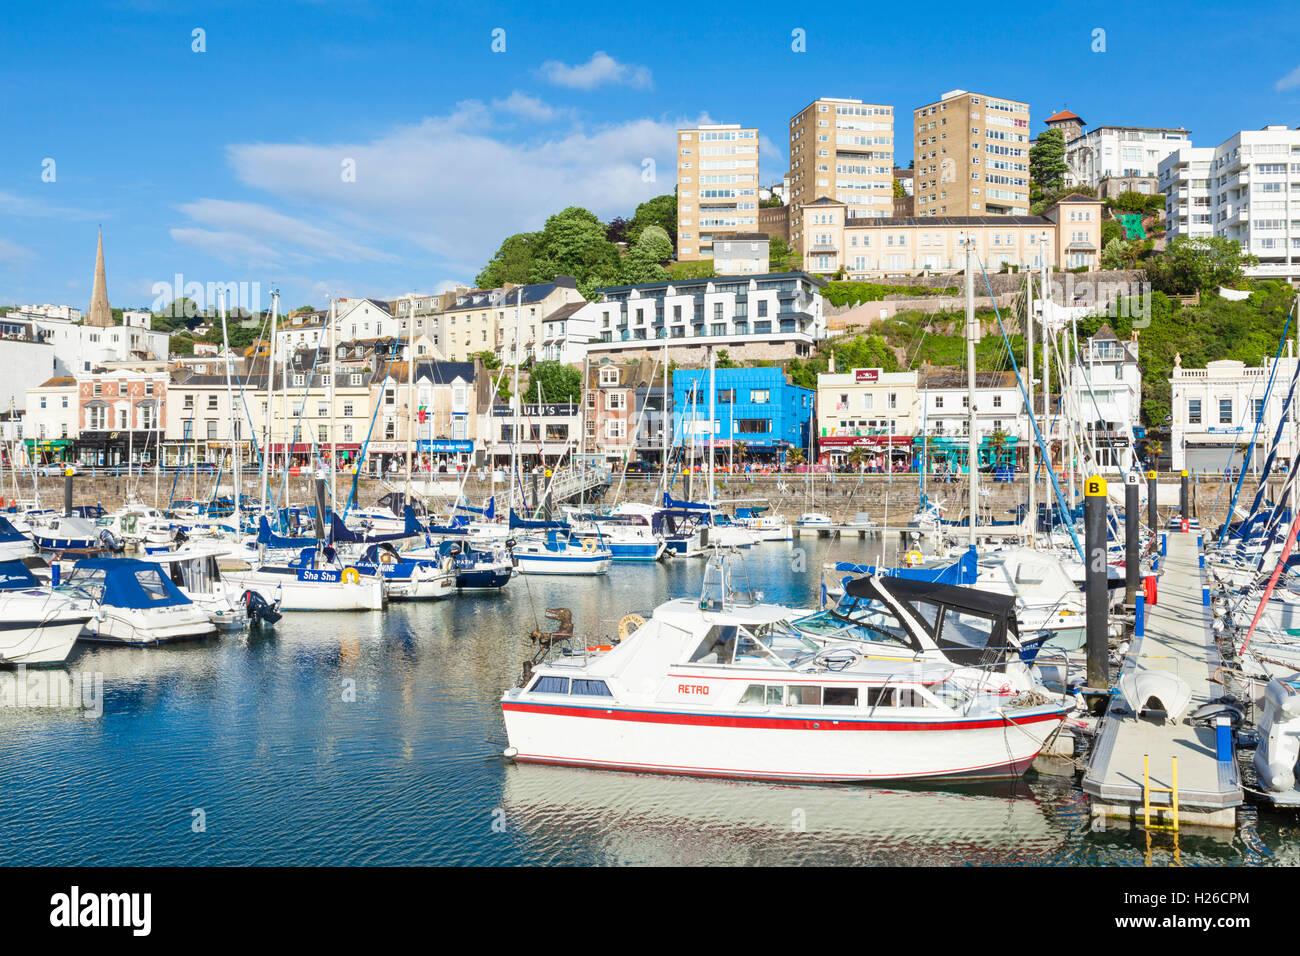 Torquay Marina und Hafen Torquay Devon England UK GB Europa EU Stockbild